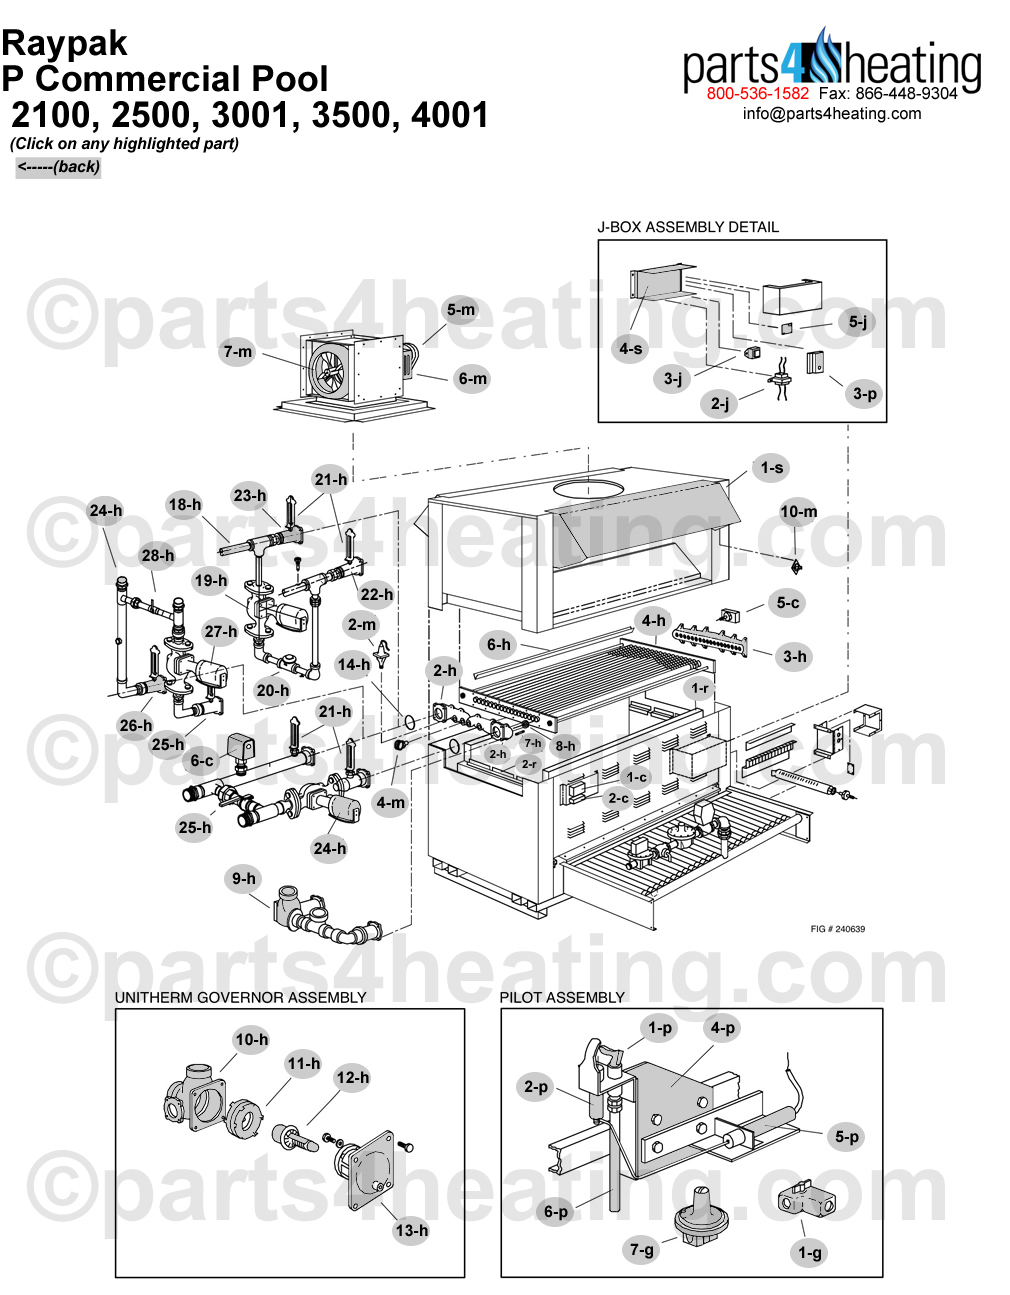 raypak commercial pool raypak hi delta boiler wiring diagram raypak hi delta boiler wiring diagram raypak hi delta boiler wiring diagram raypak hi delta boiler wiring diagram